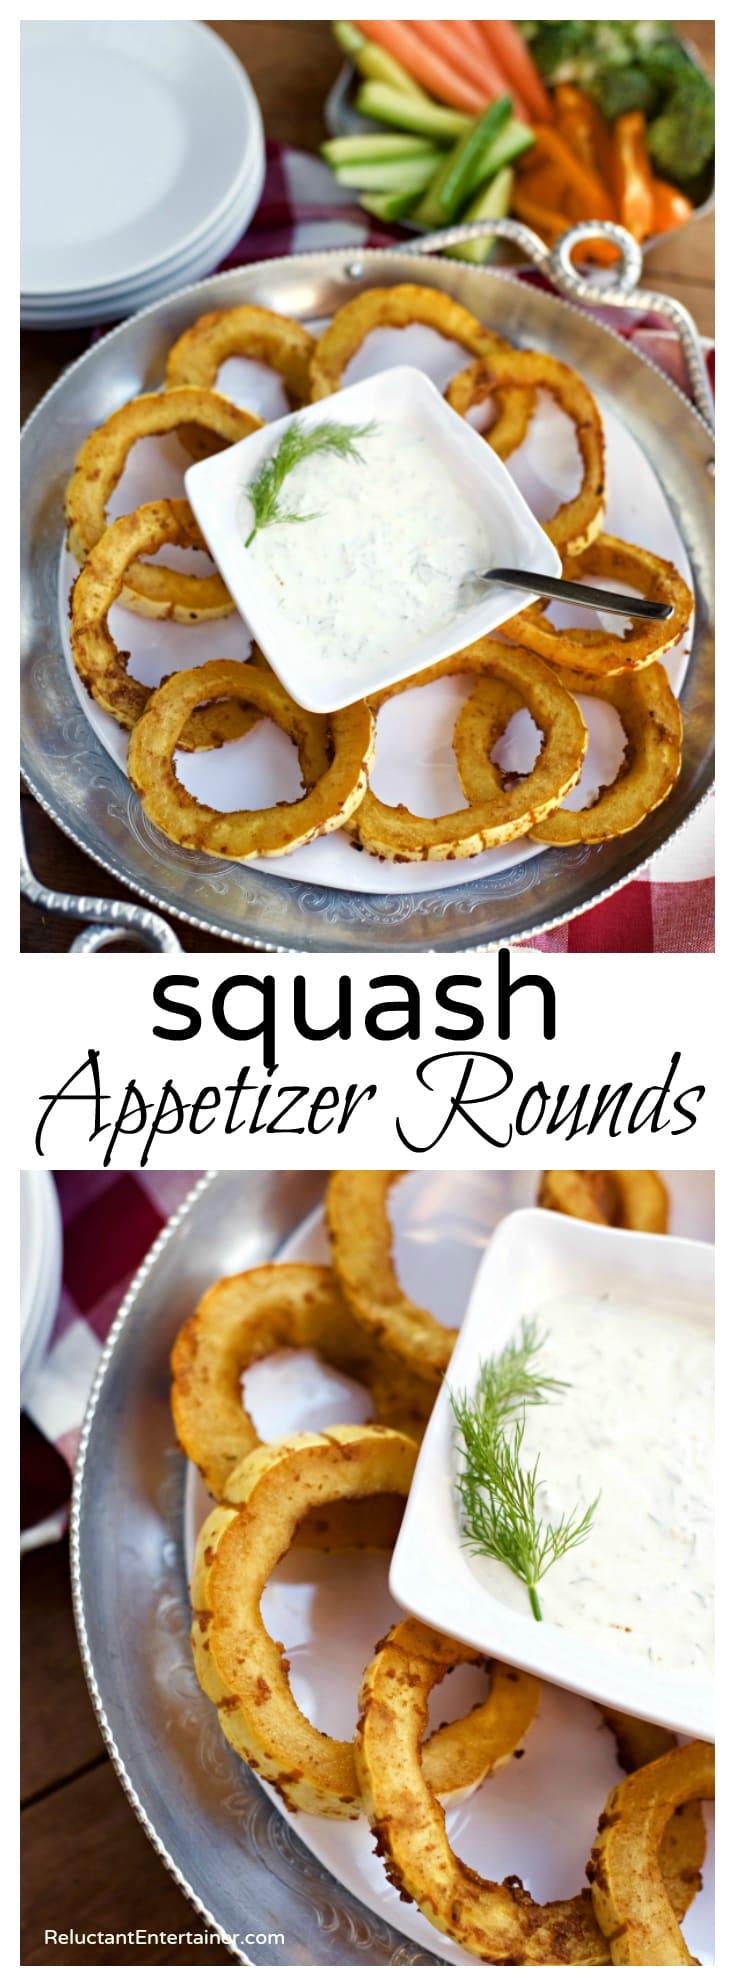 Squash Appetizer Rounds Recipe